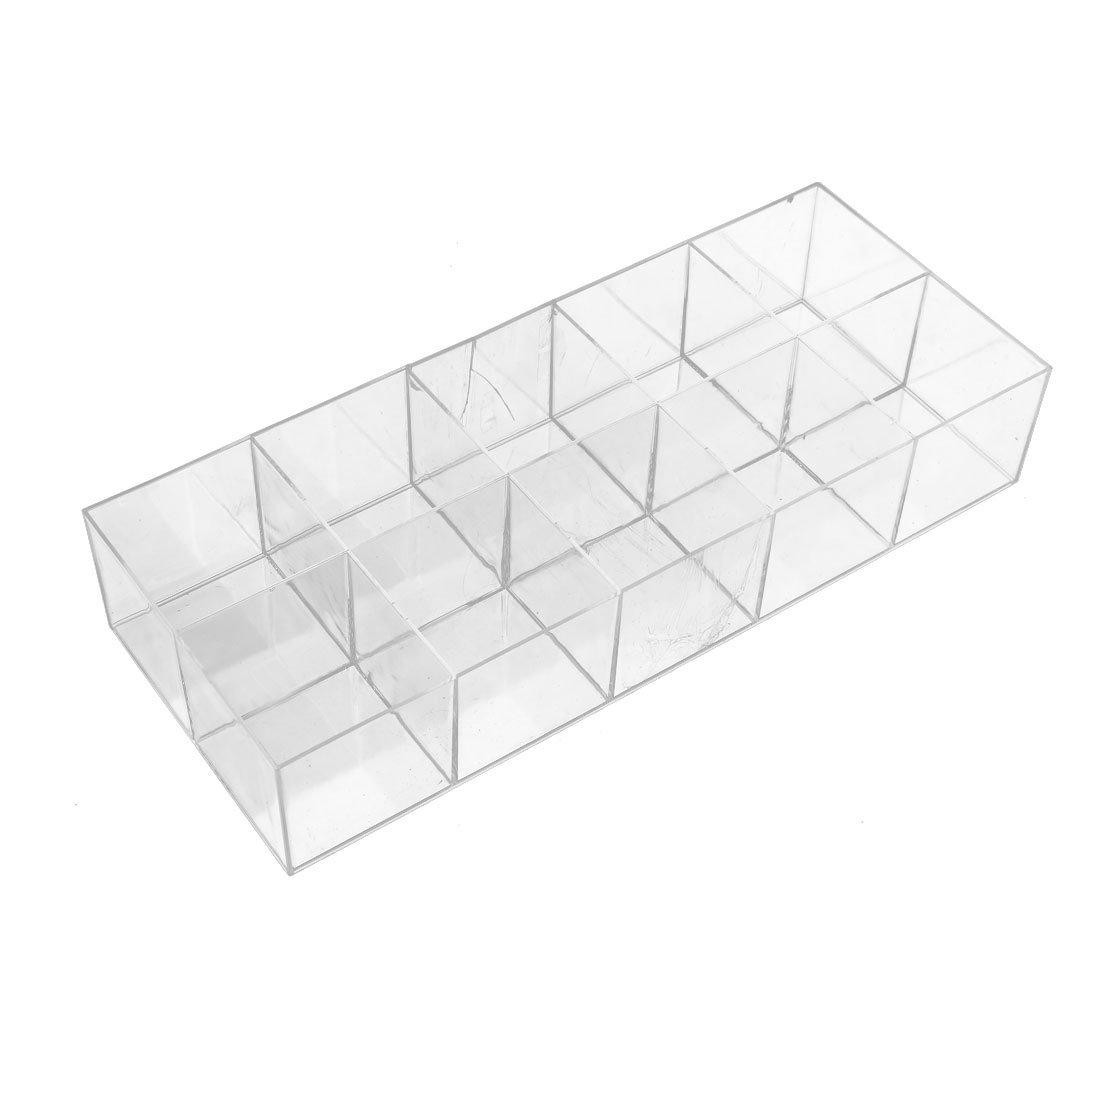 uxcell 310mmx128mmx59mm 10 Slots Component Storage Organizer Case DIY Tool Clear